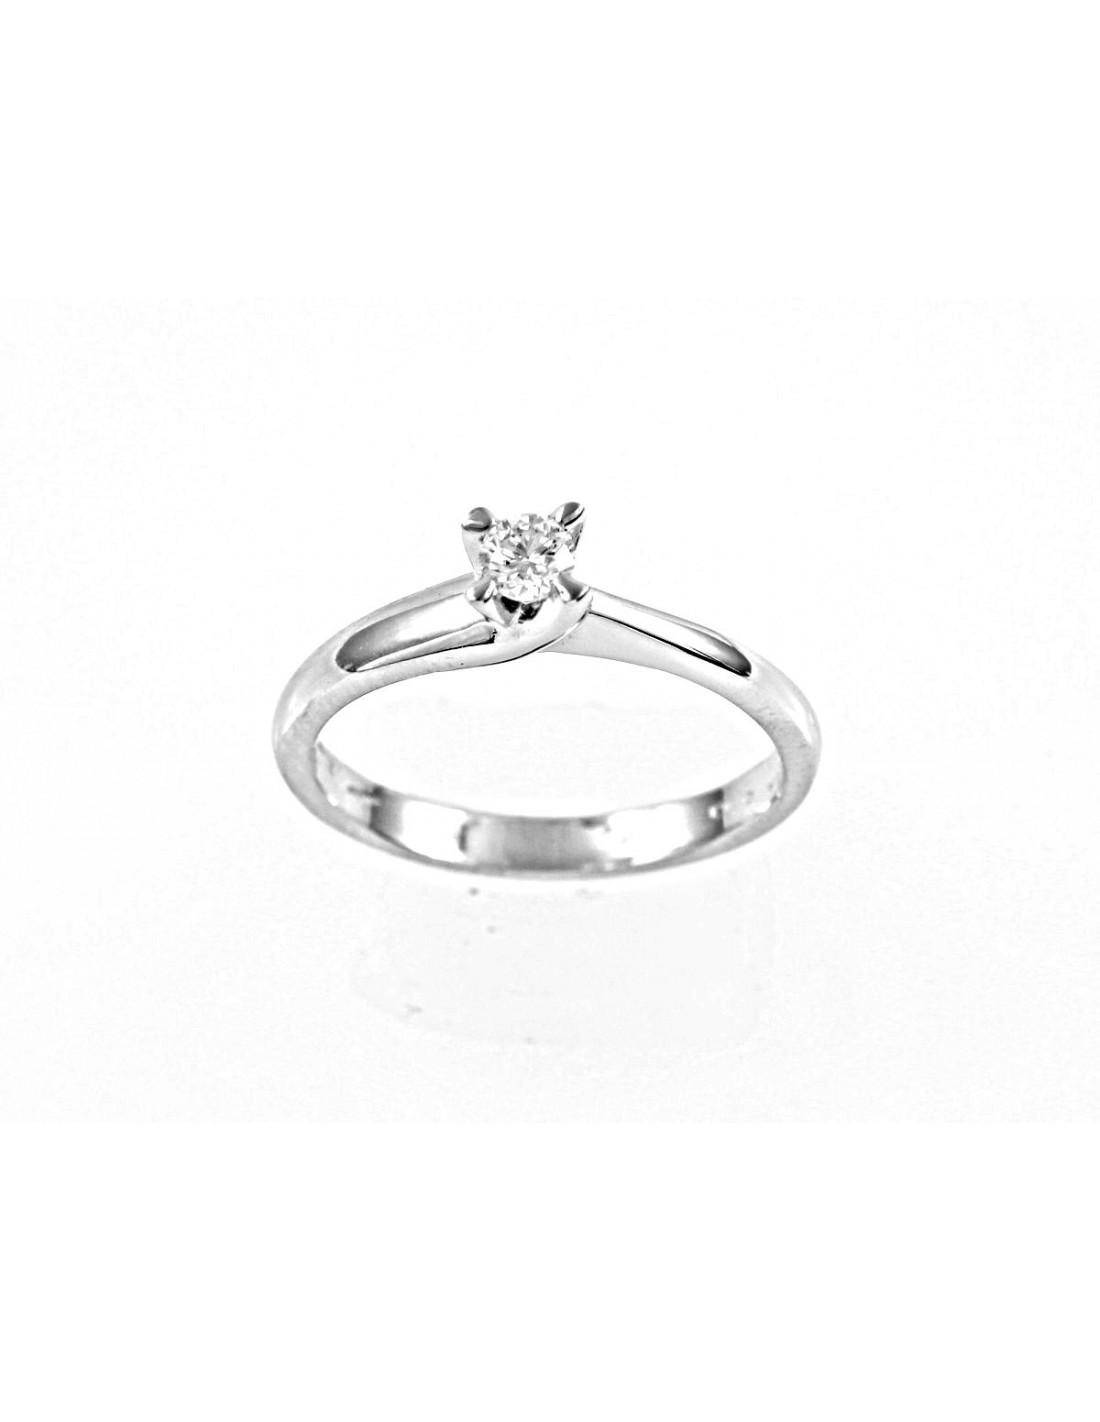 a52bda46094e anillo de diamante solitario NAPOLIkt. 0.12 Opera Italiana Jewellery